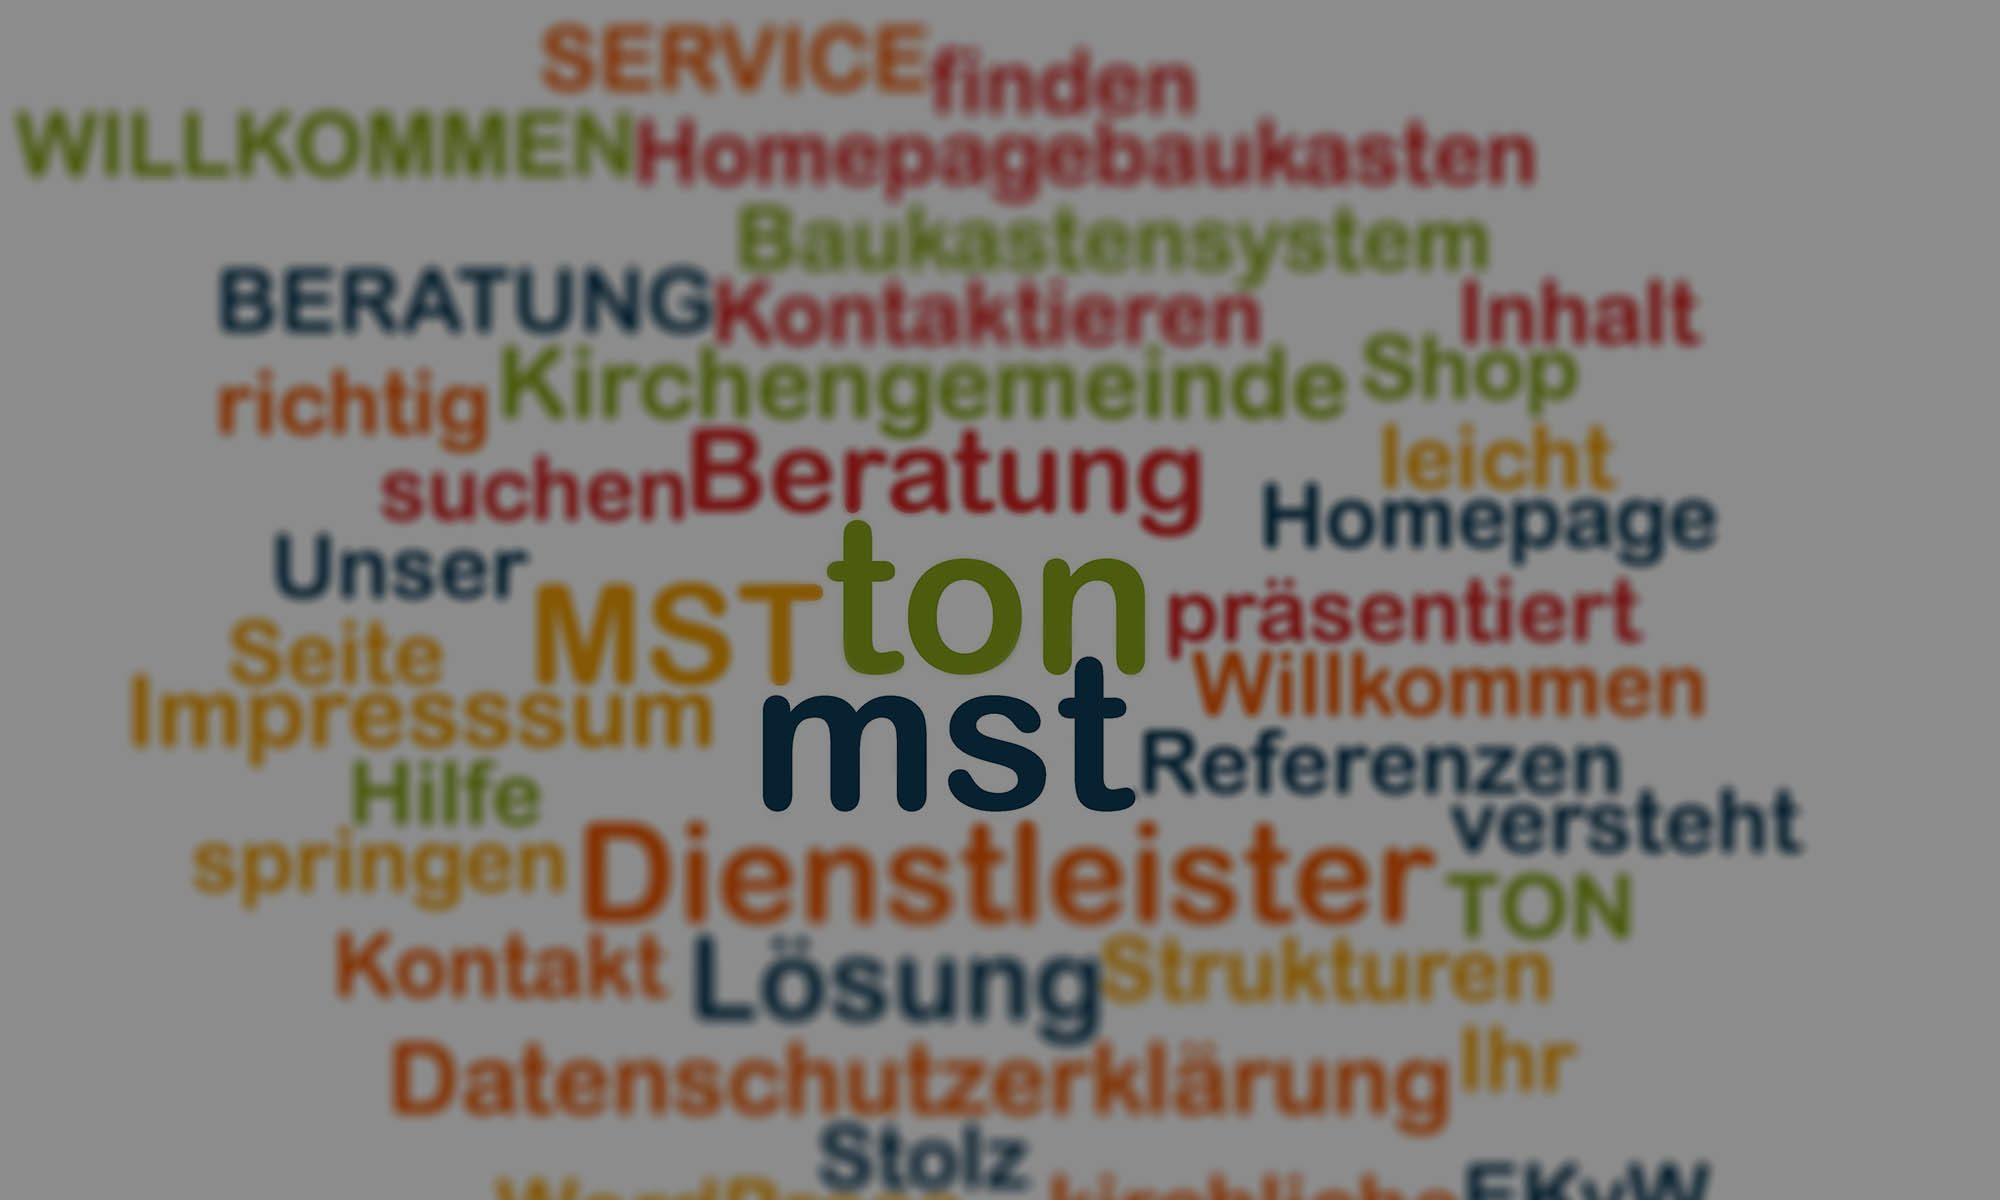 mst-ton - Beratung - Service